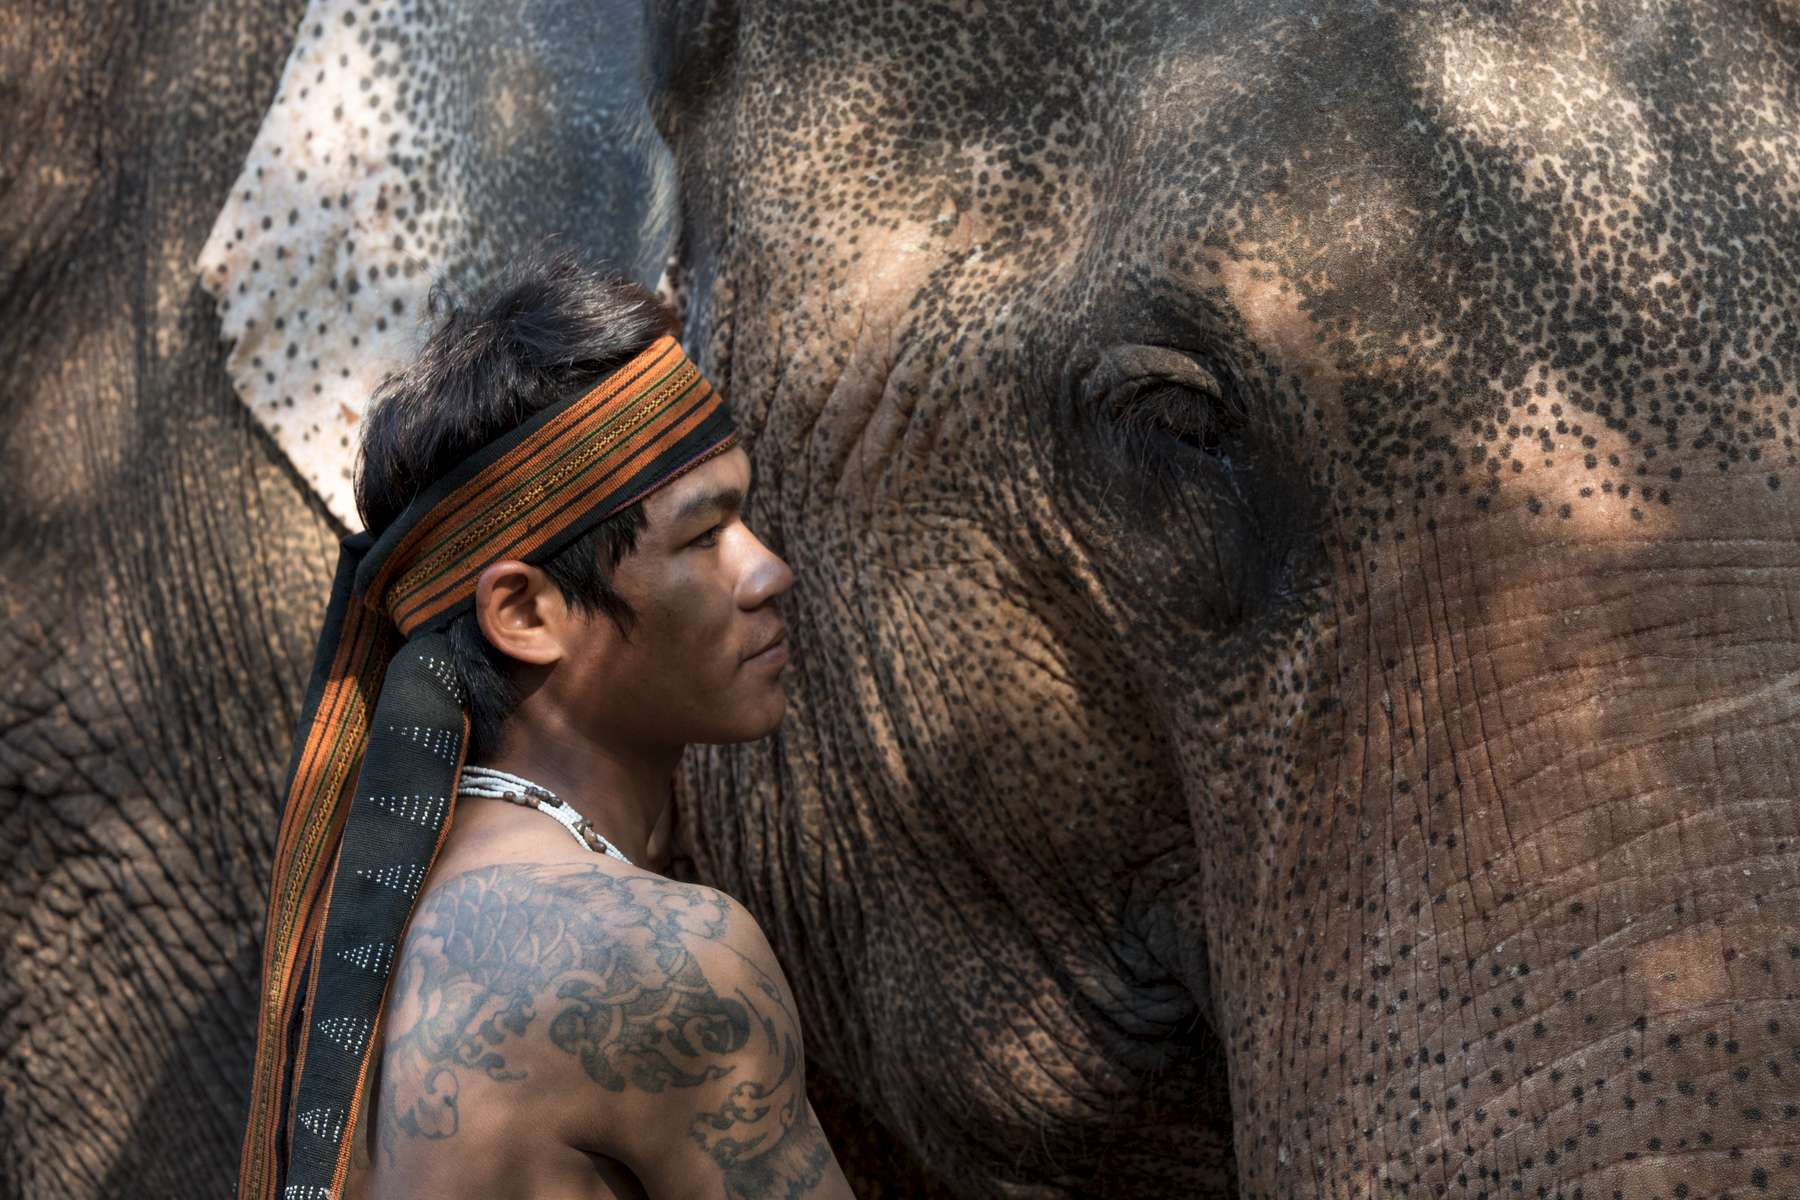 Laos-Asian-Elephant-Mahout-Photo-by-Cyril-Eberle-CEB_3240-web